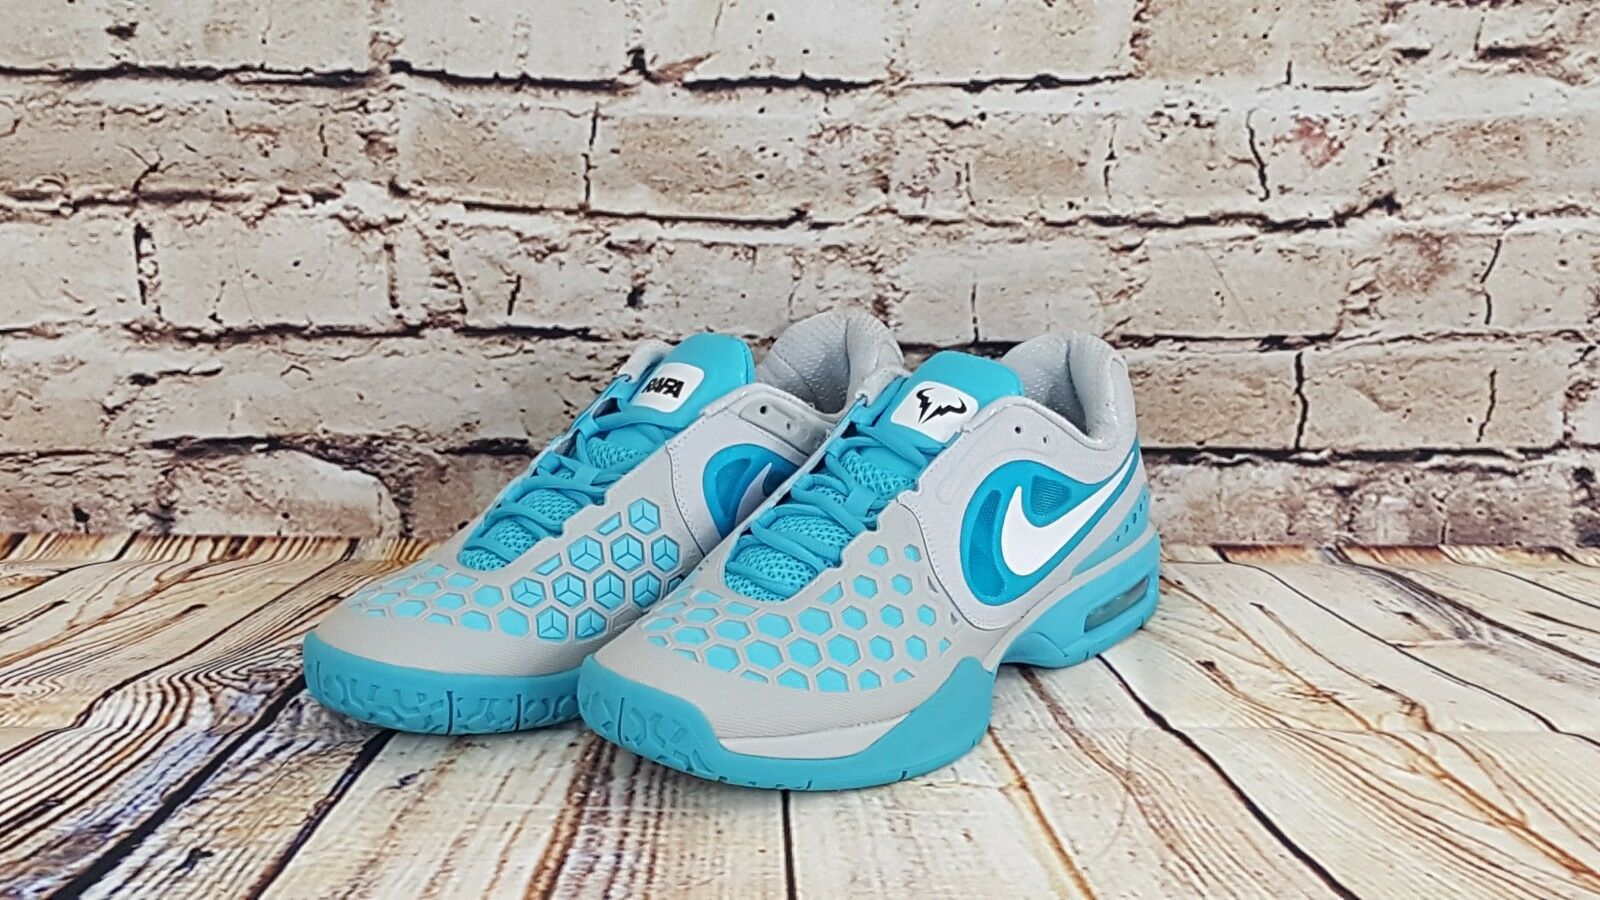 Nike air max uomini courtballistec 4.3 scarpa da tennis shanghai maestro libero da